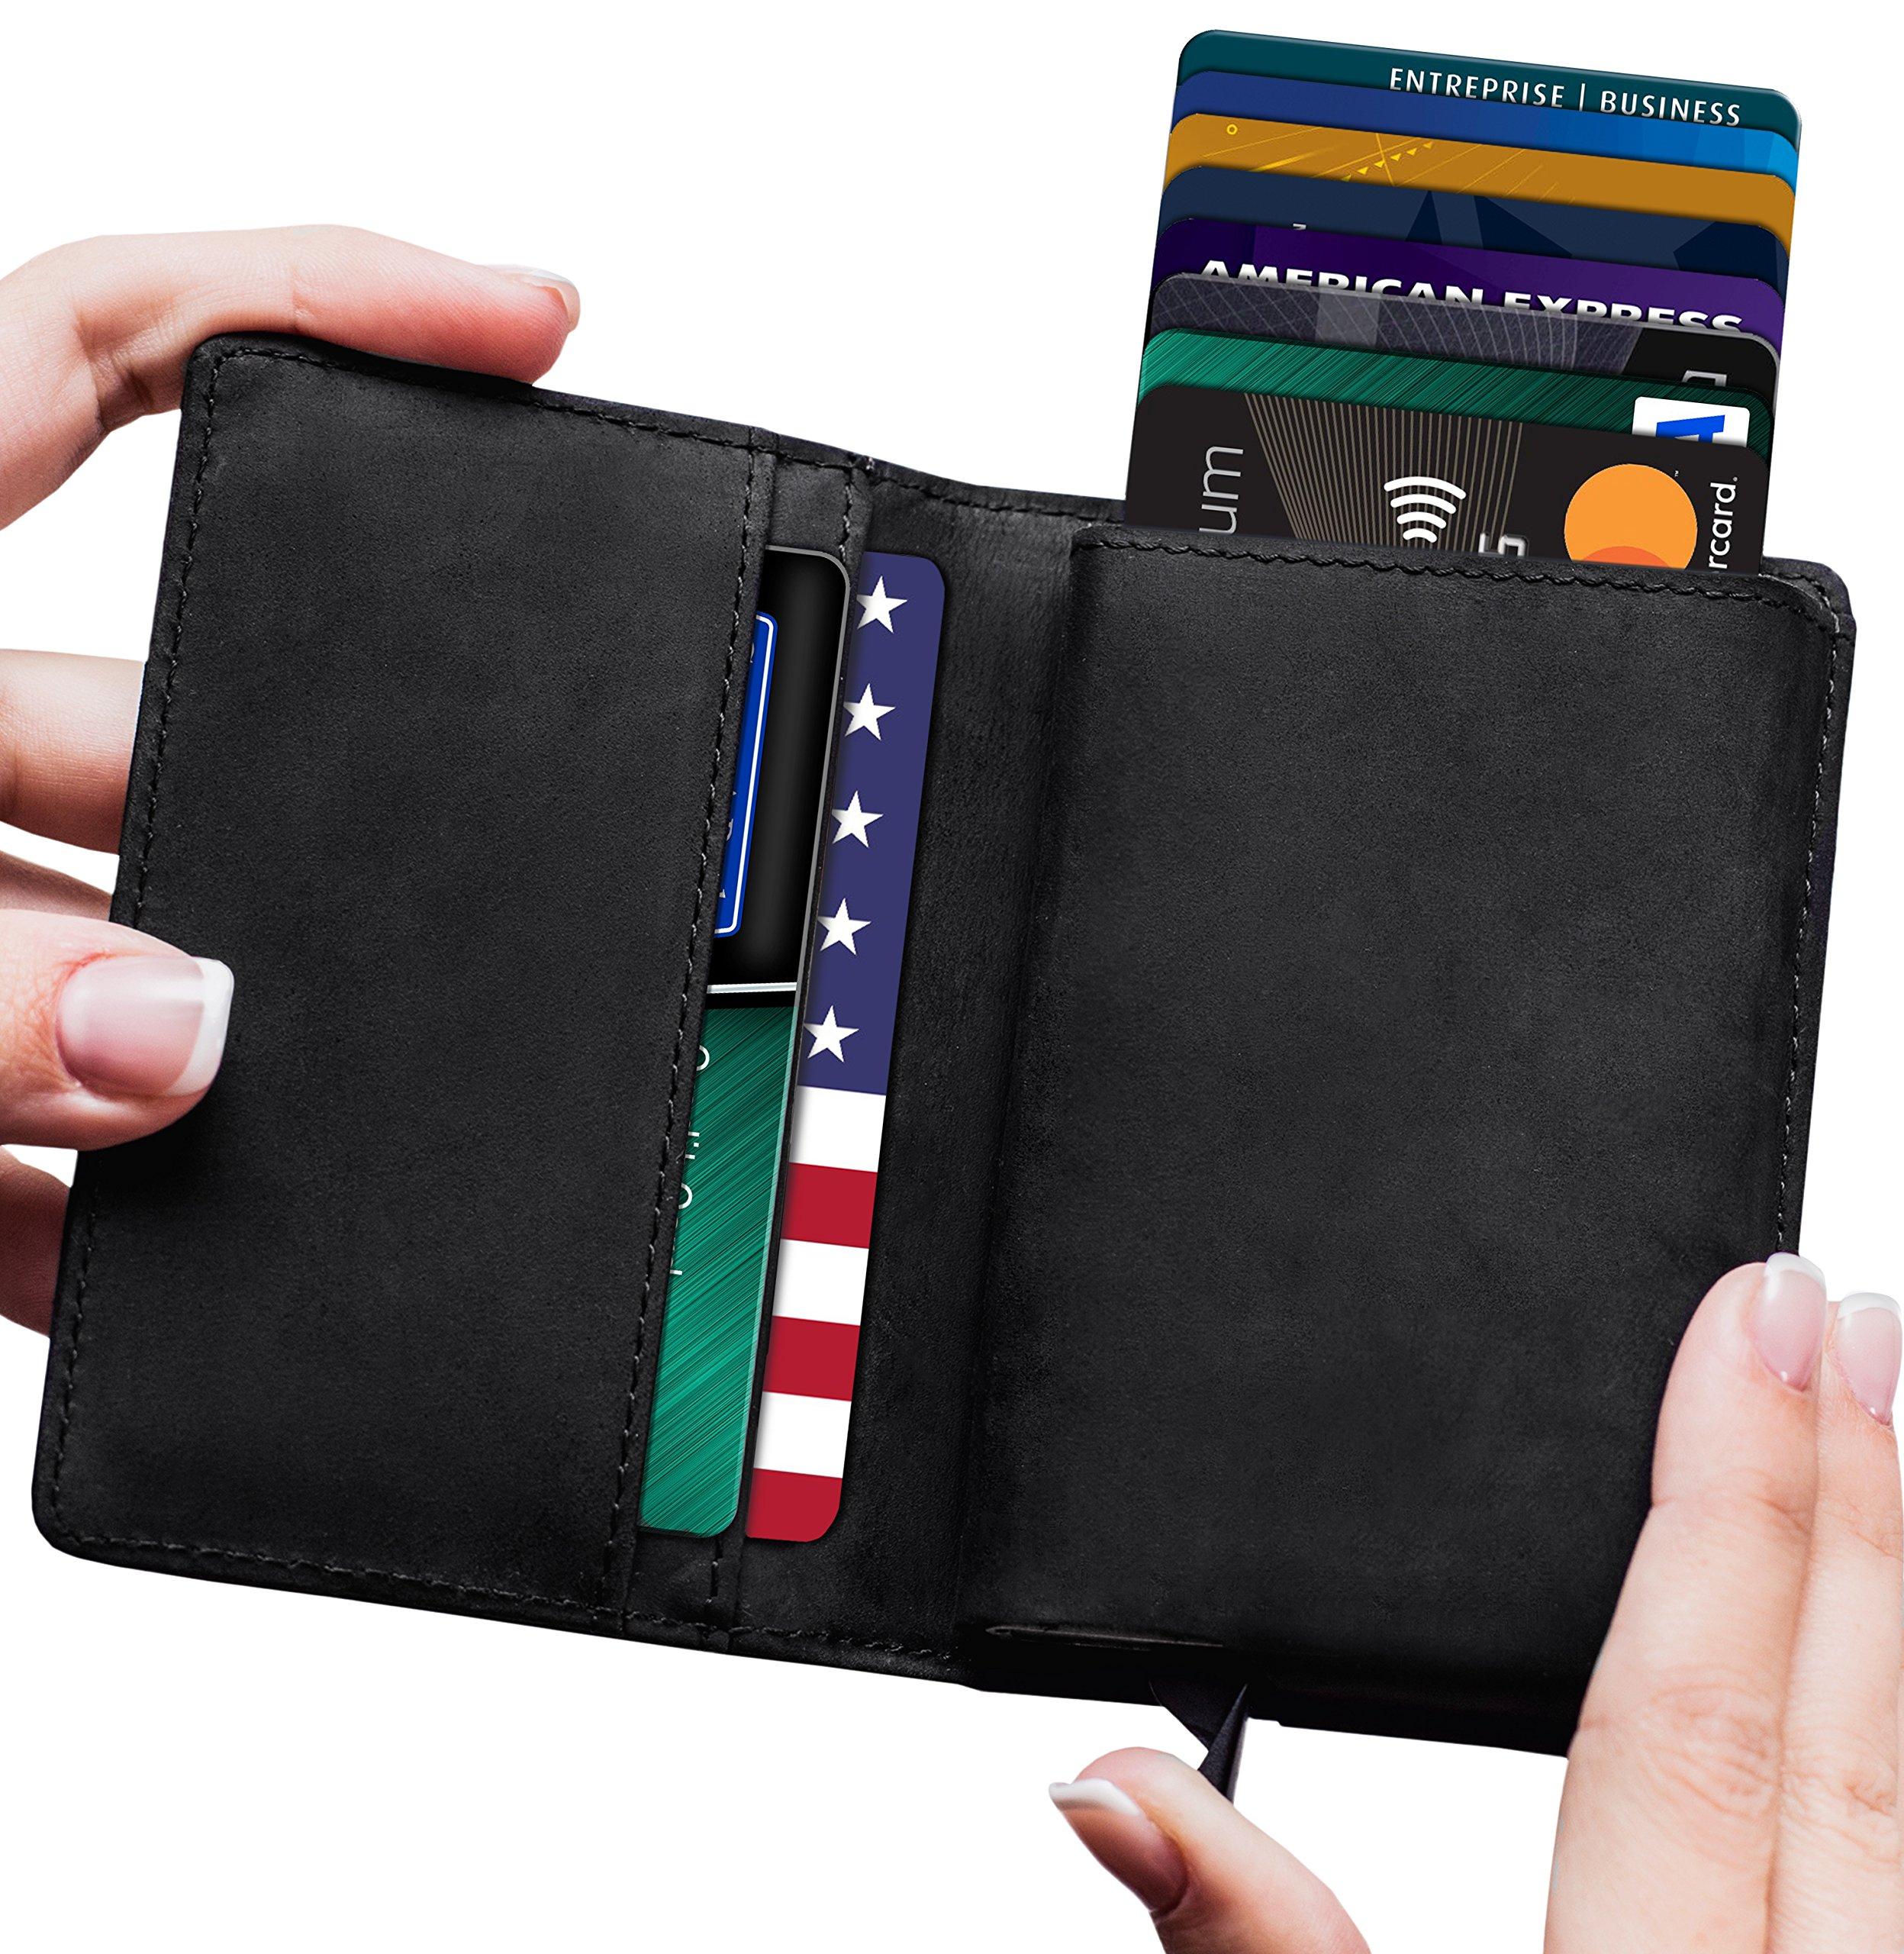 Lefada Us Men's Minimalist Leather Wallet RFID Blocking + Aluminum Card Holder v2.0 by Lefada Us